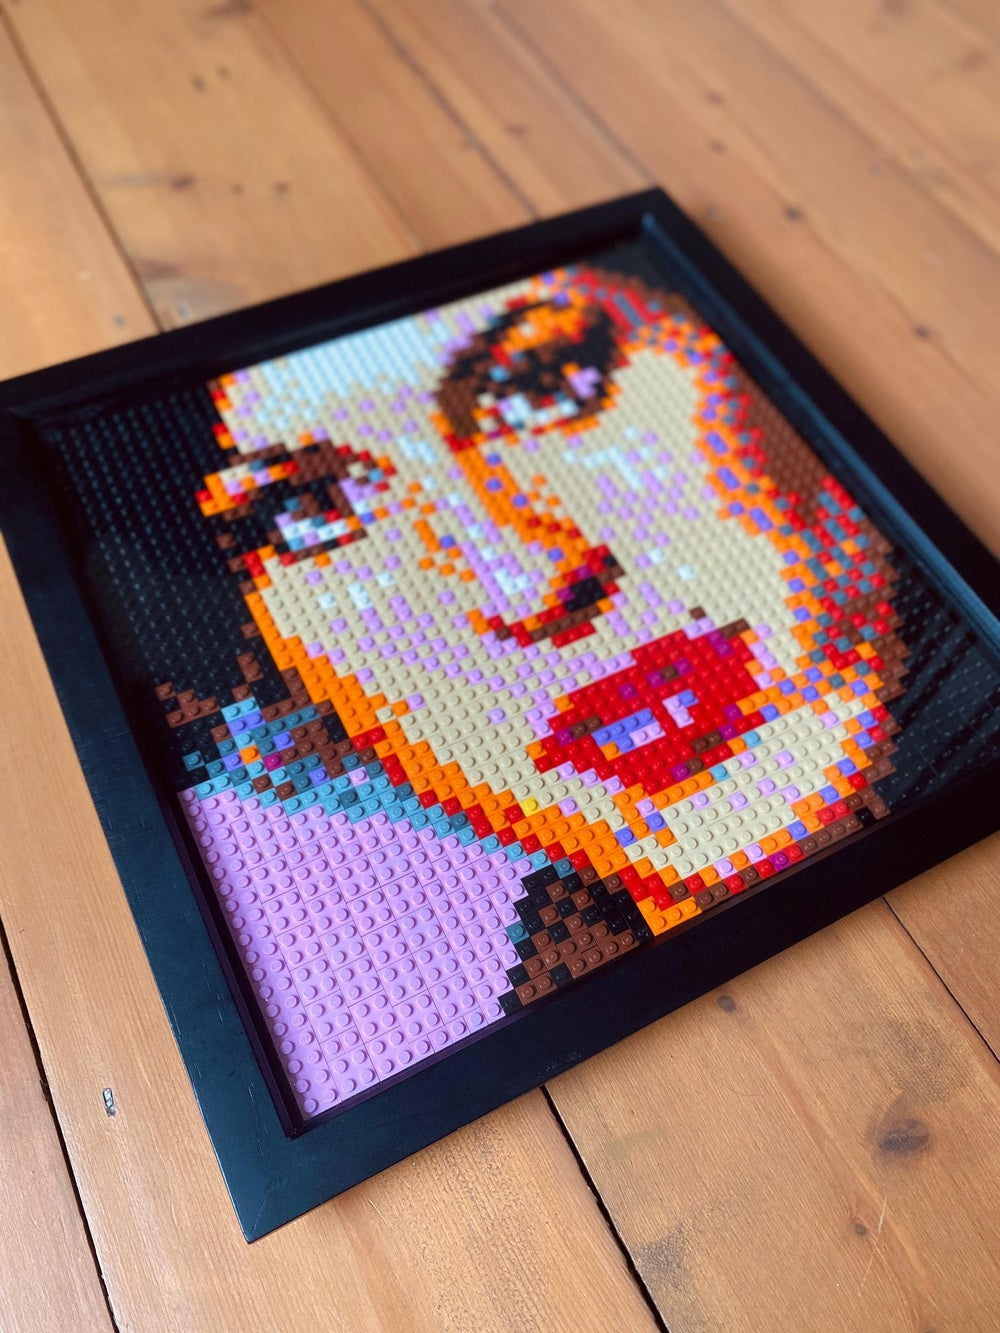 'Amy in Brick' Lego Art by Grifshead